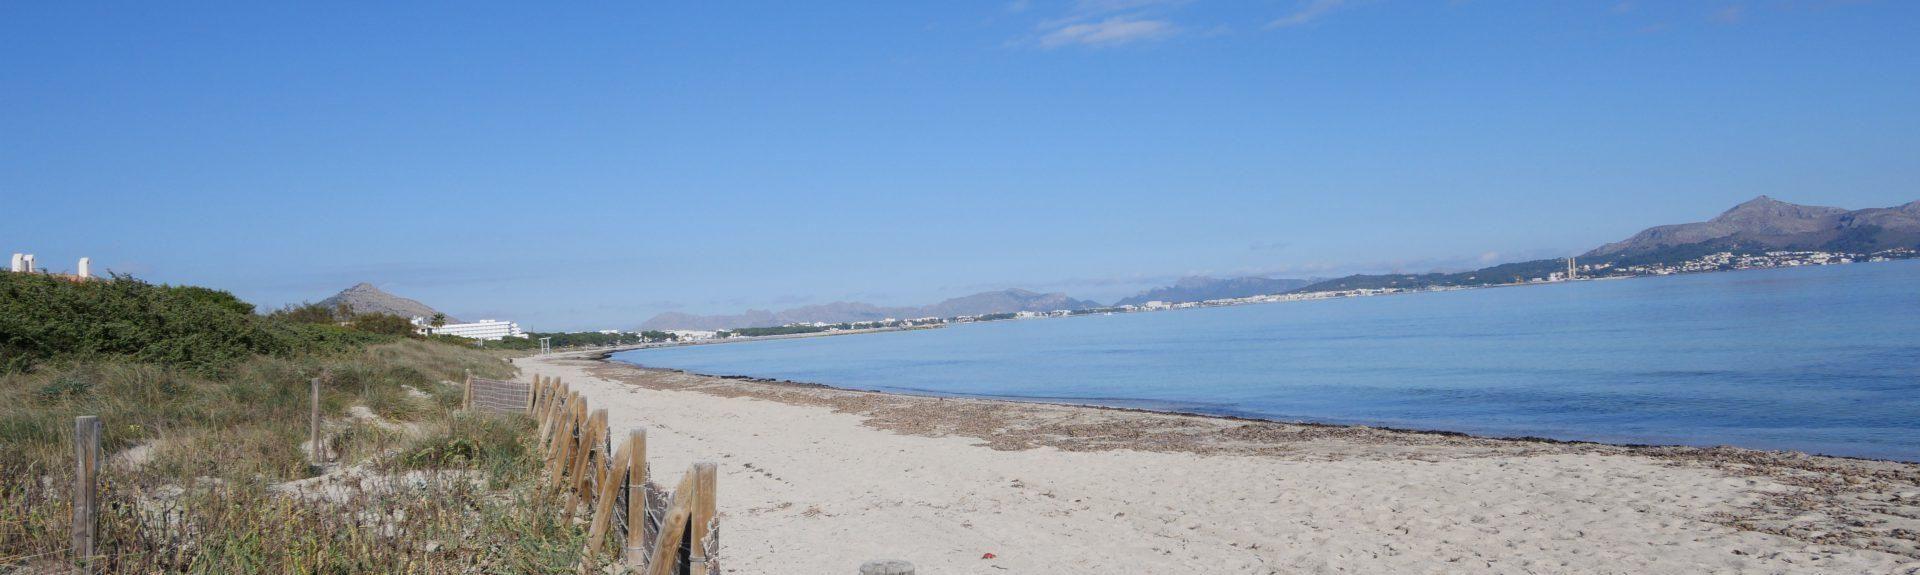 Pula Golf, Son Servera, Balearic Islands, Spain